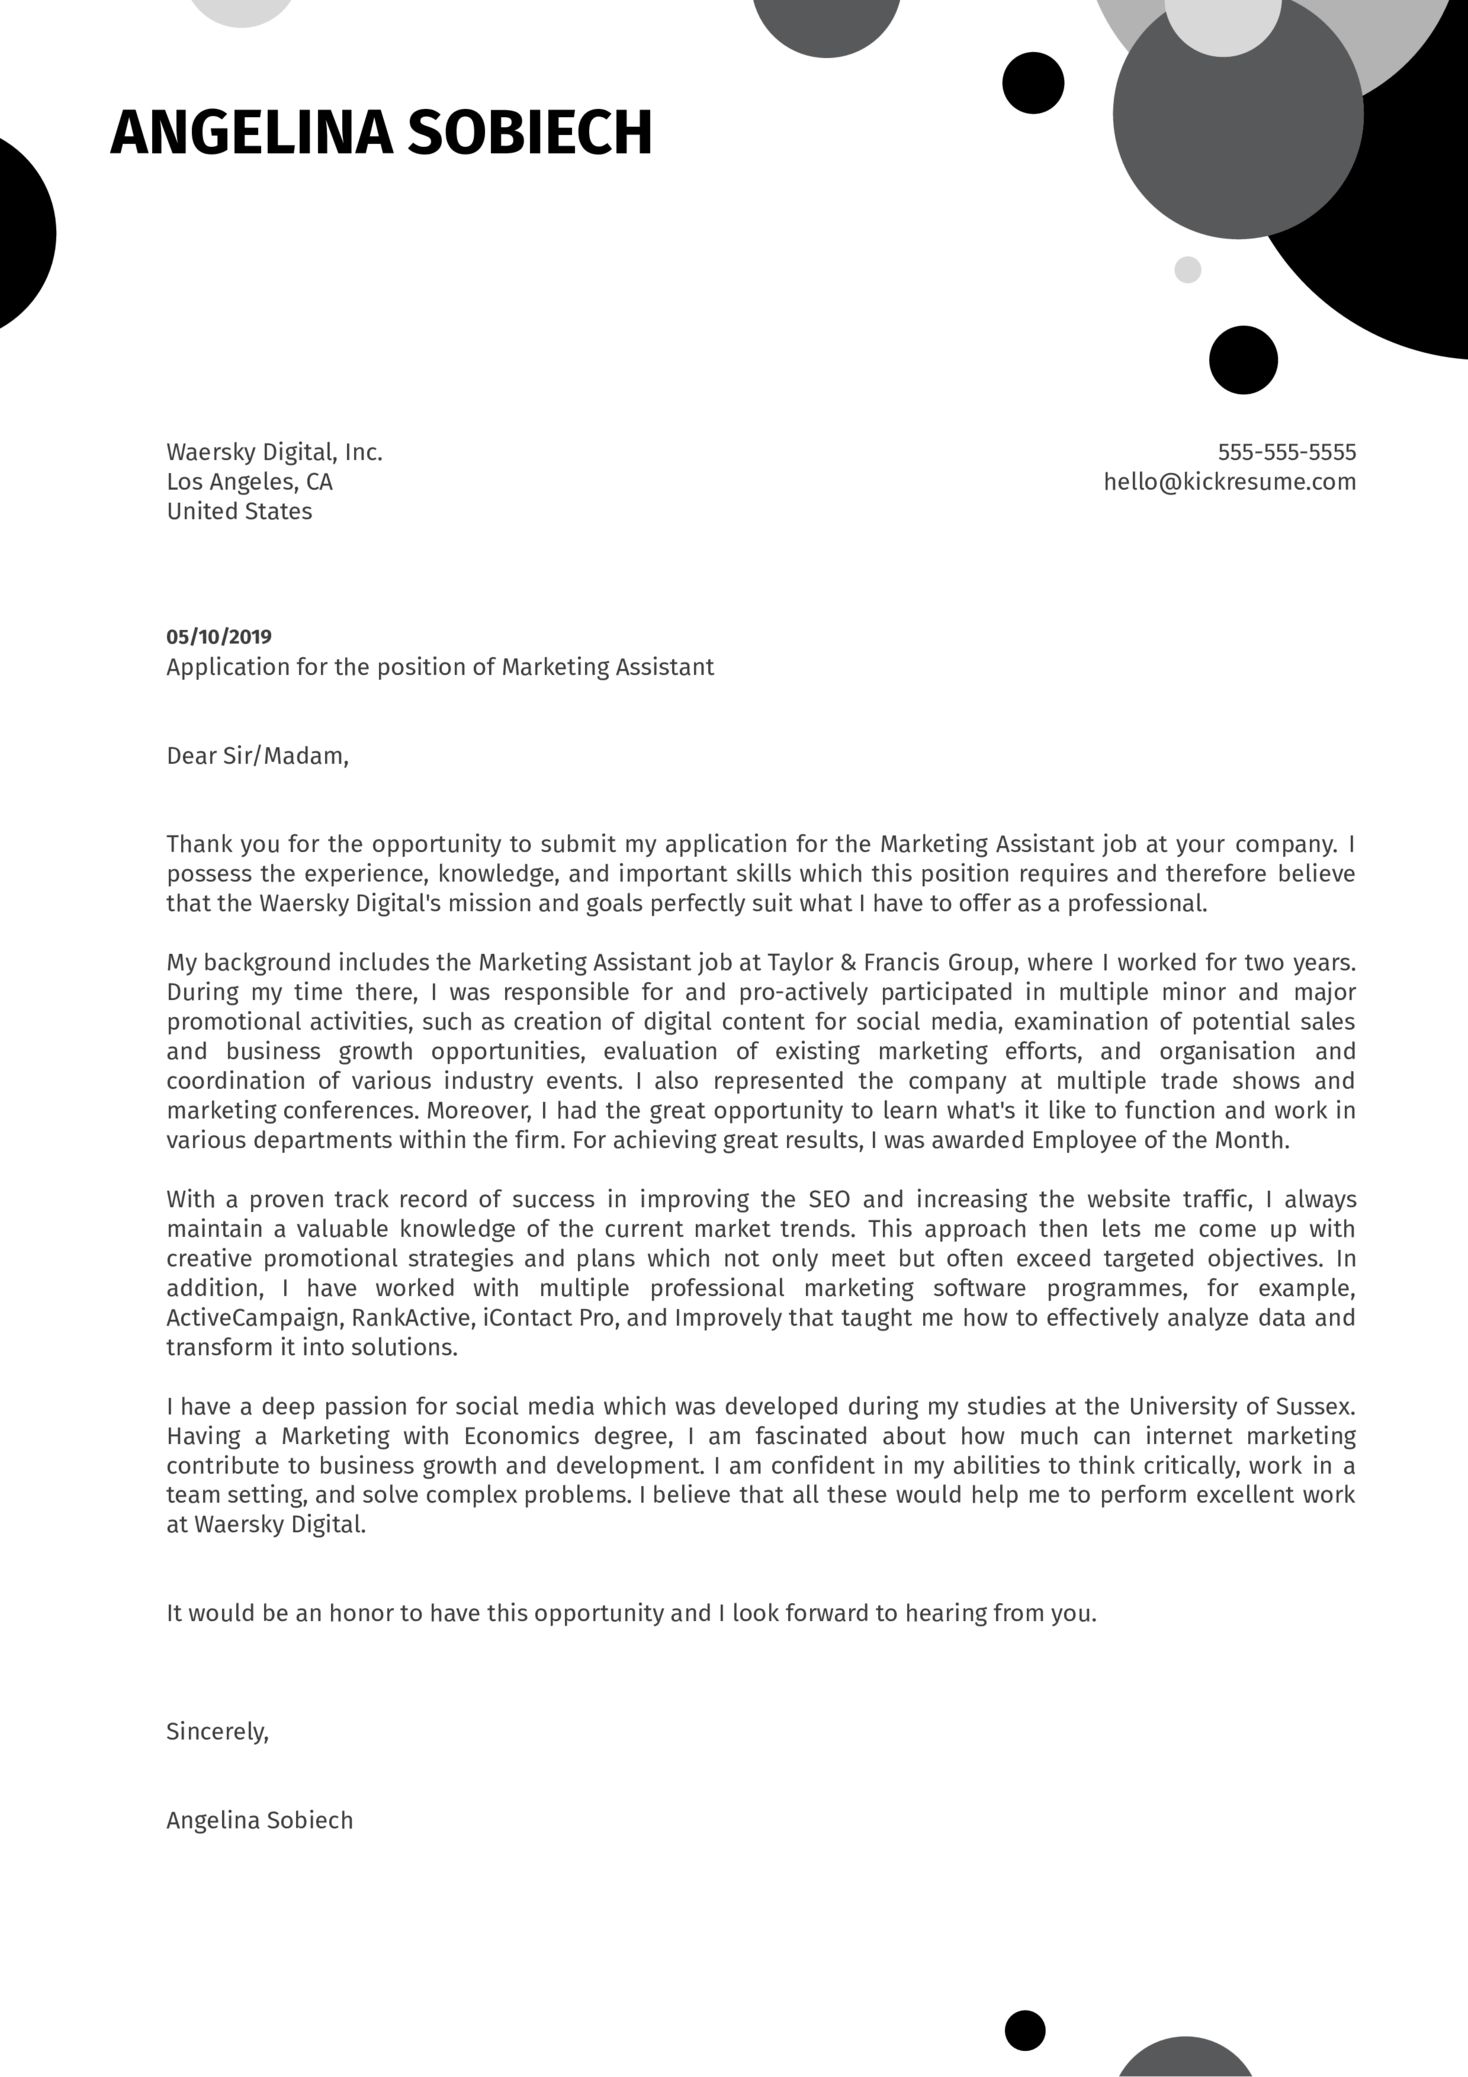 Marketing Assistant Cover Letter Sample